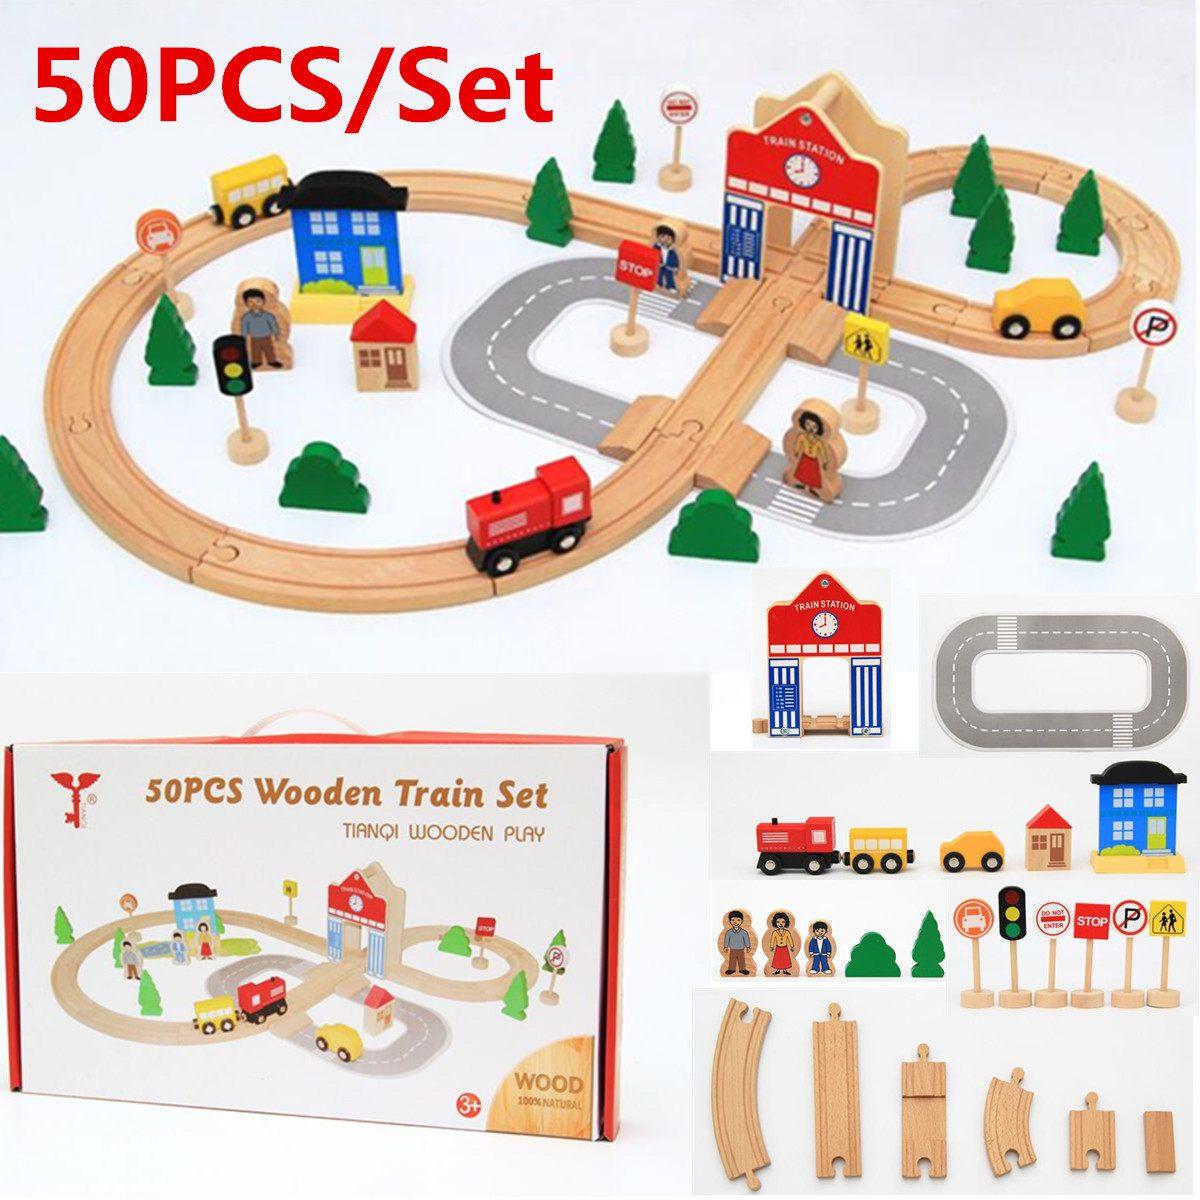 50PCS Wooden Train Track Railway Bridge Electric Train Track Set Magnetic Racing Track Blocks Vehicles Kids Toys Children Gifts